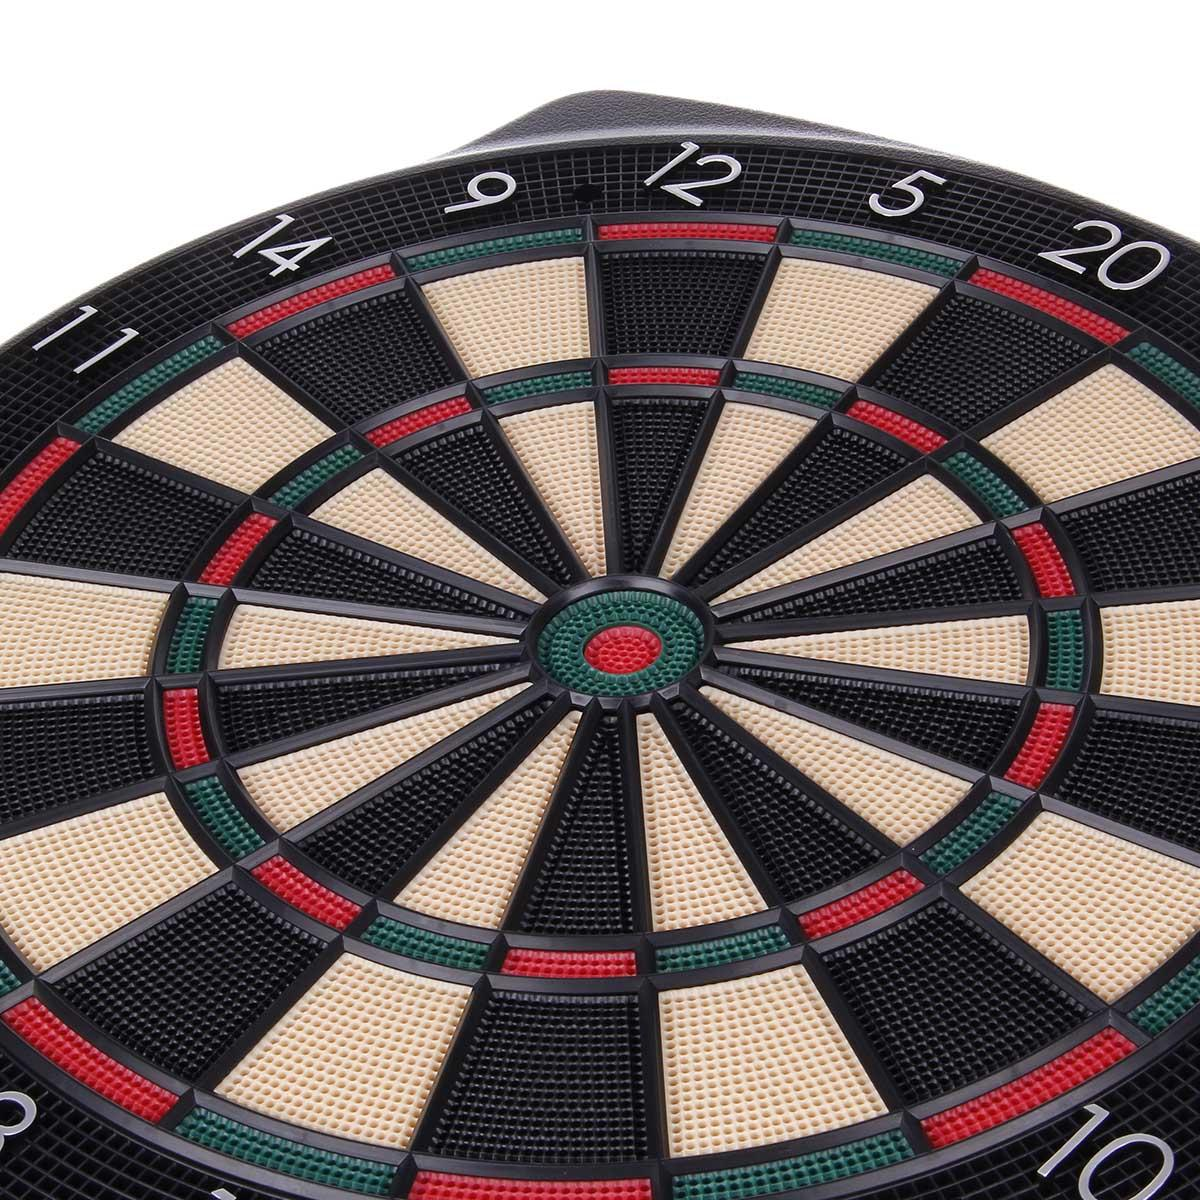 2020 Winmax Elctronic Dartboard Scoring Board Set LED Display 6 Darts Electronic Dart Board